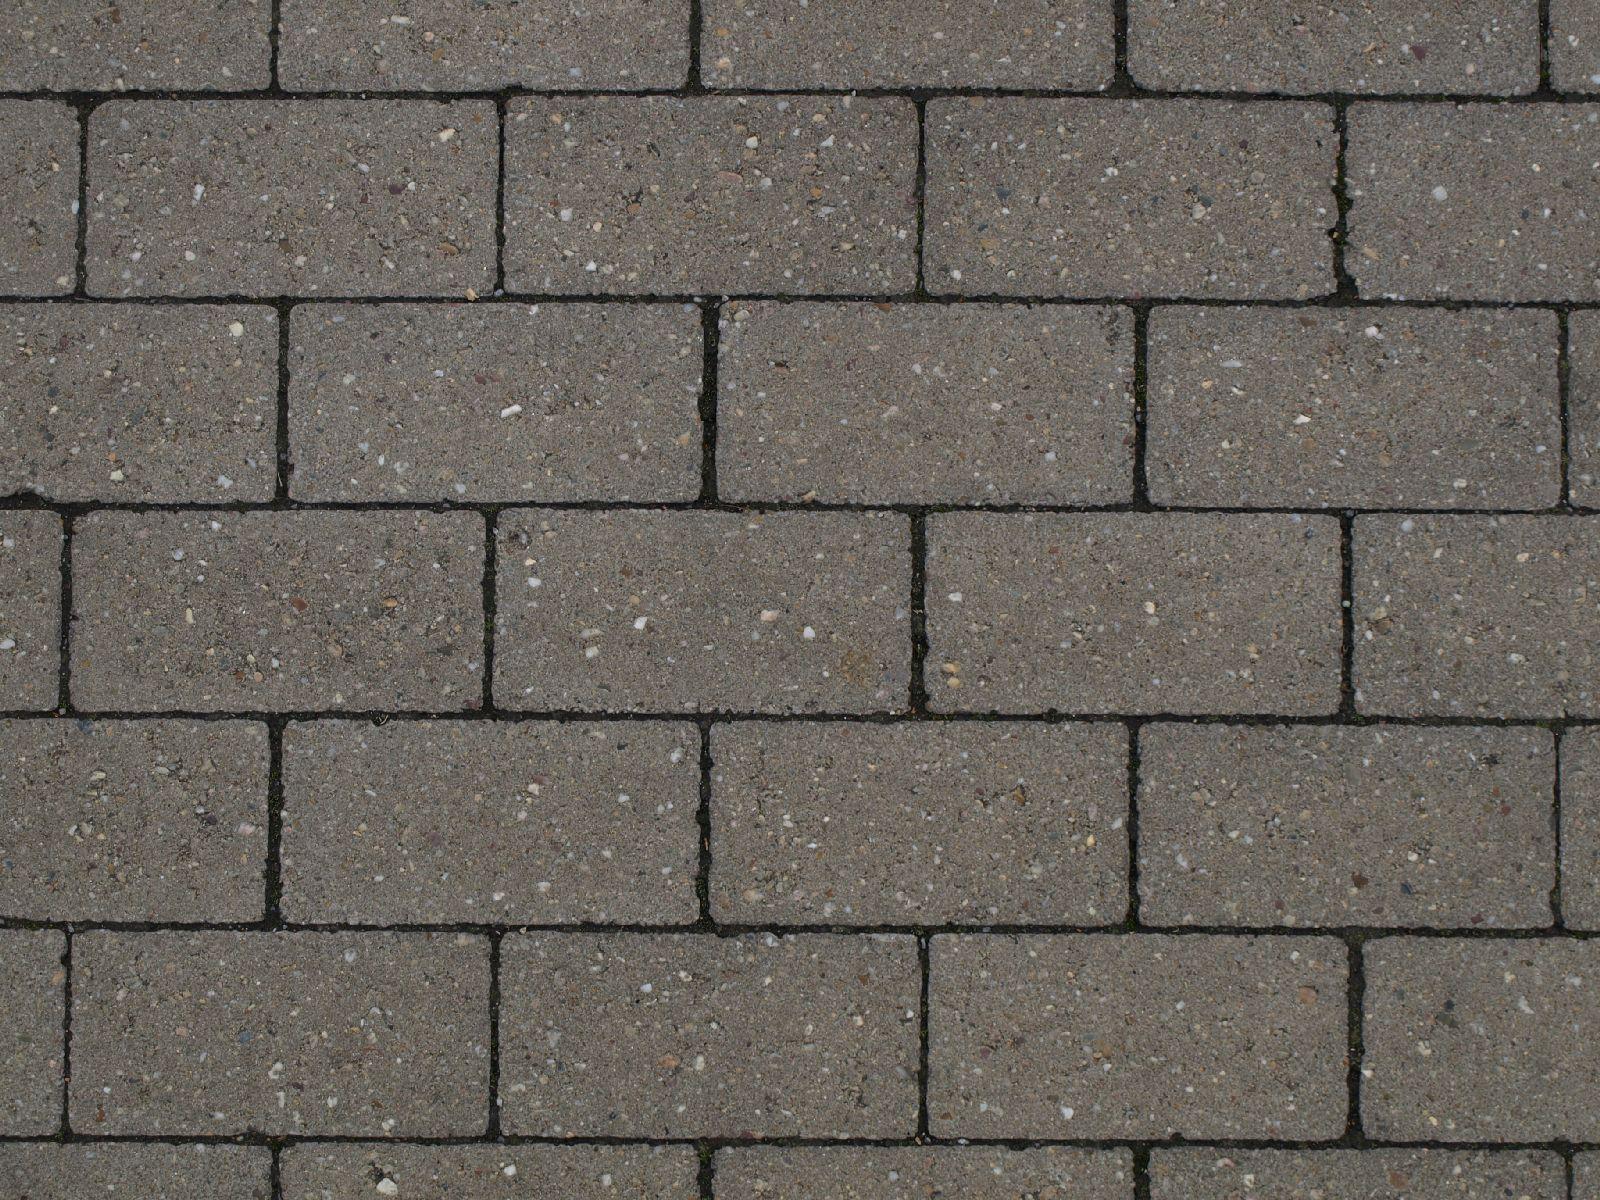 Ground-Urban_Texture_A_PA045738